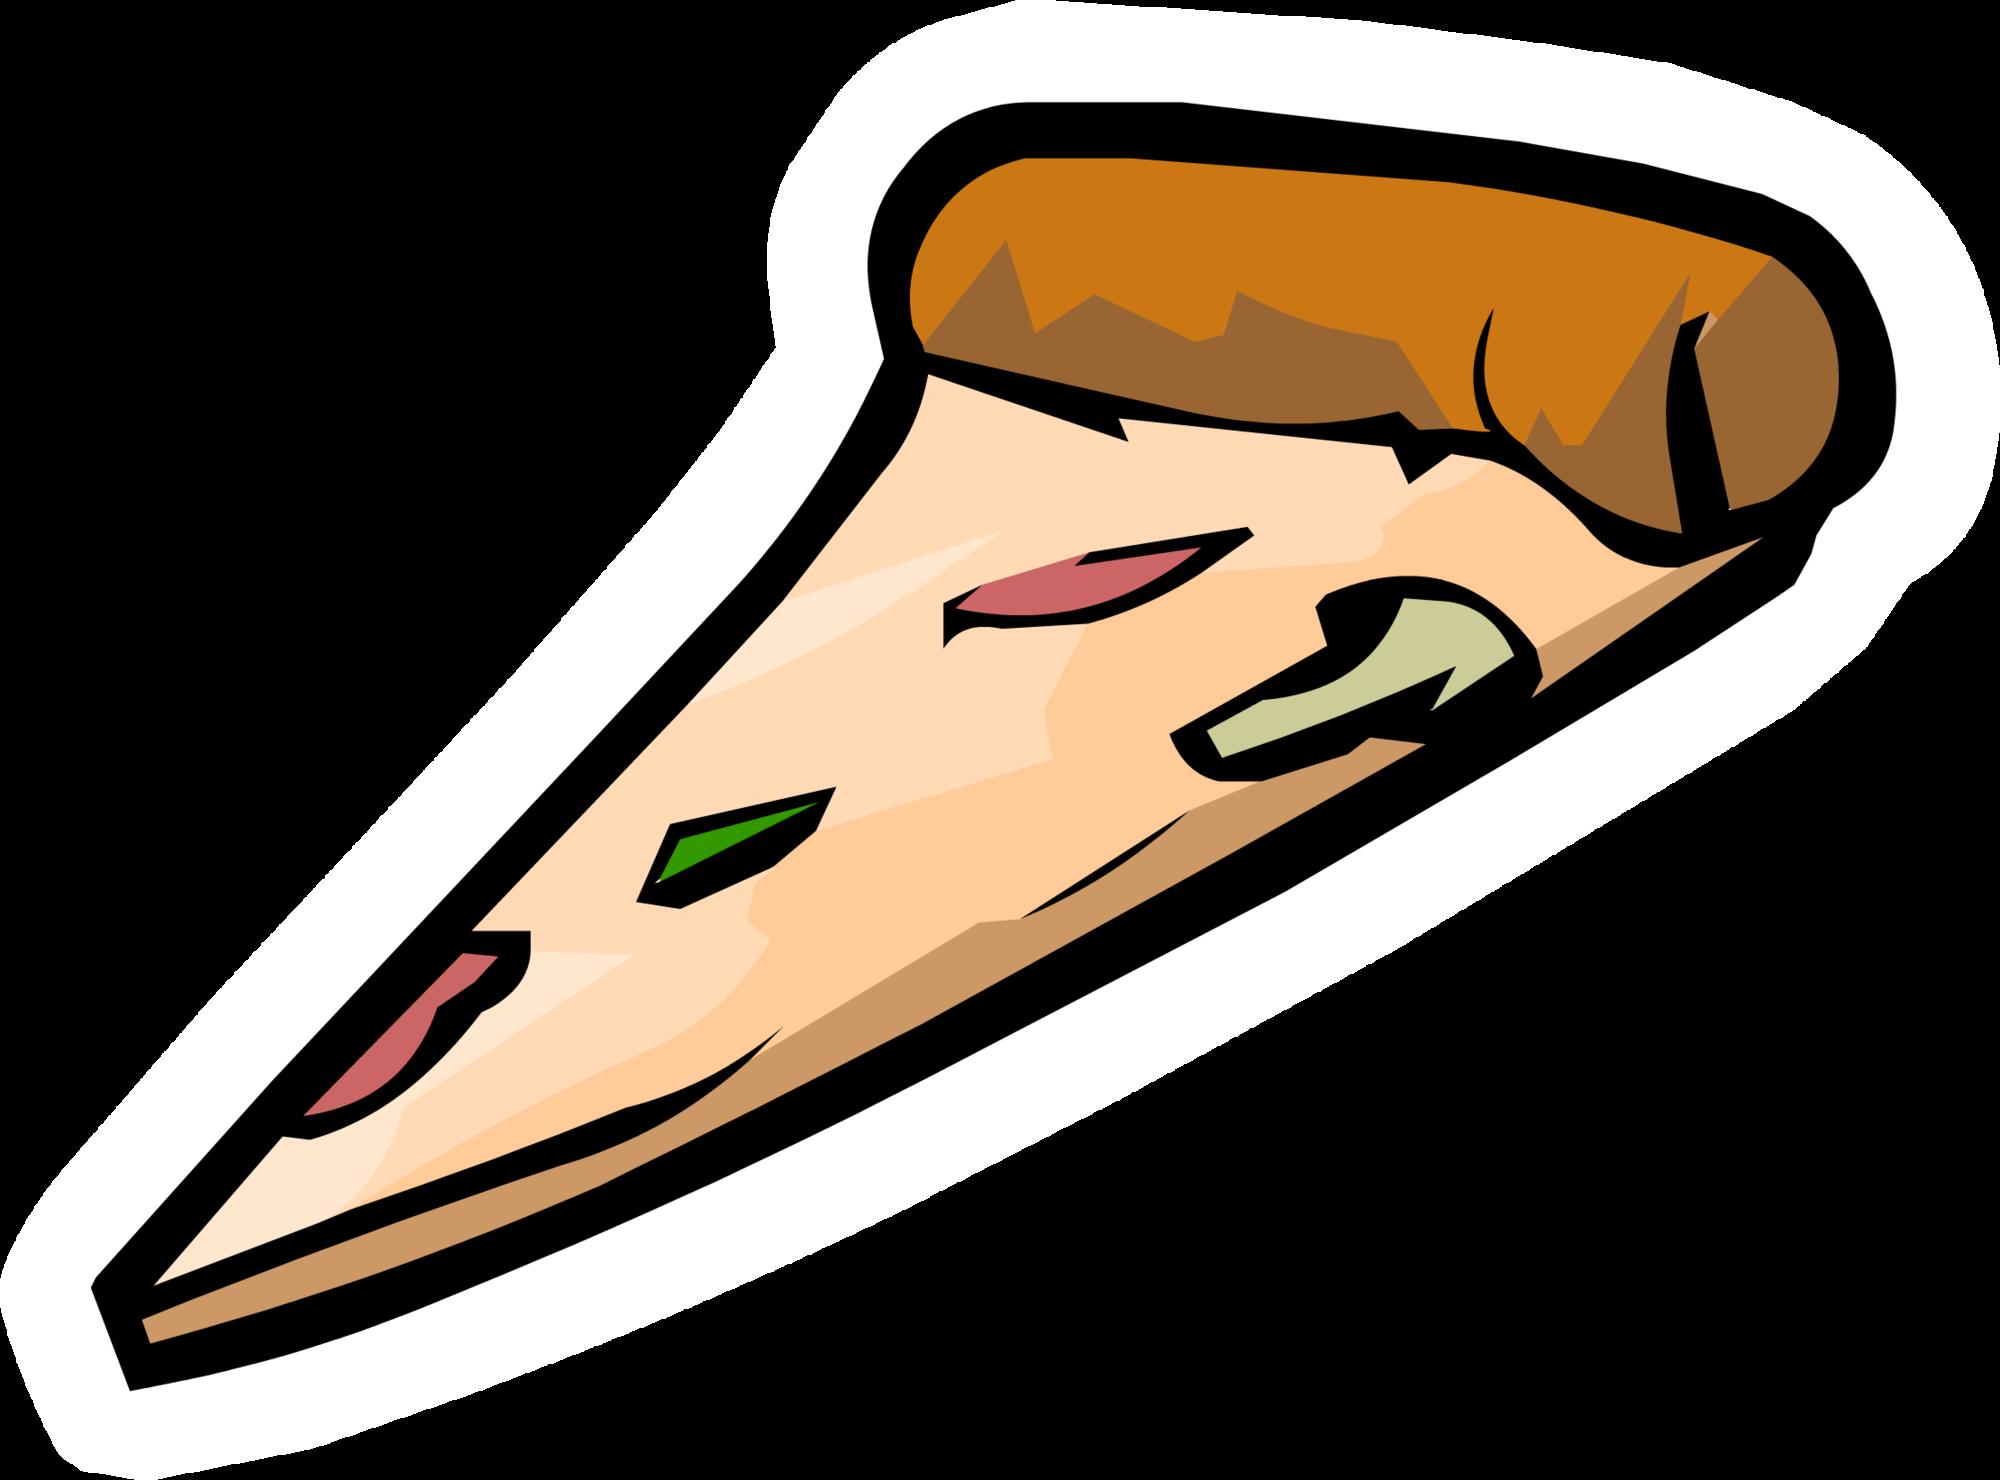 Alpha penguin wiki fandom. Clipart restaurant pizza parlor